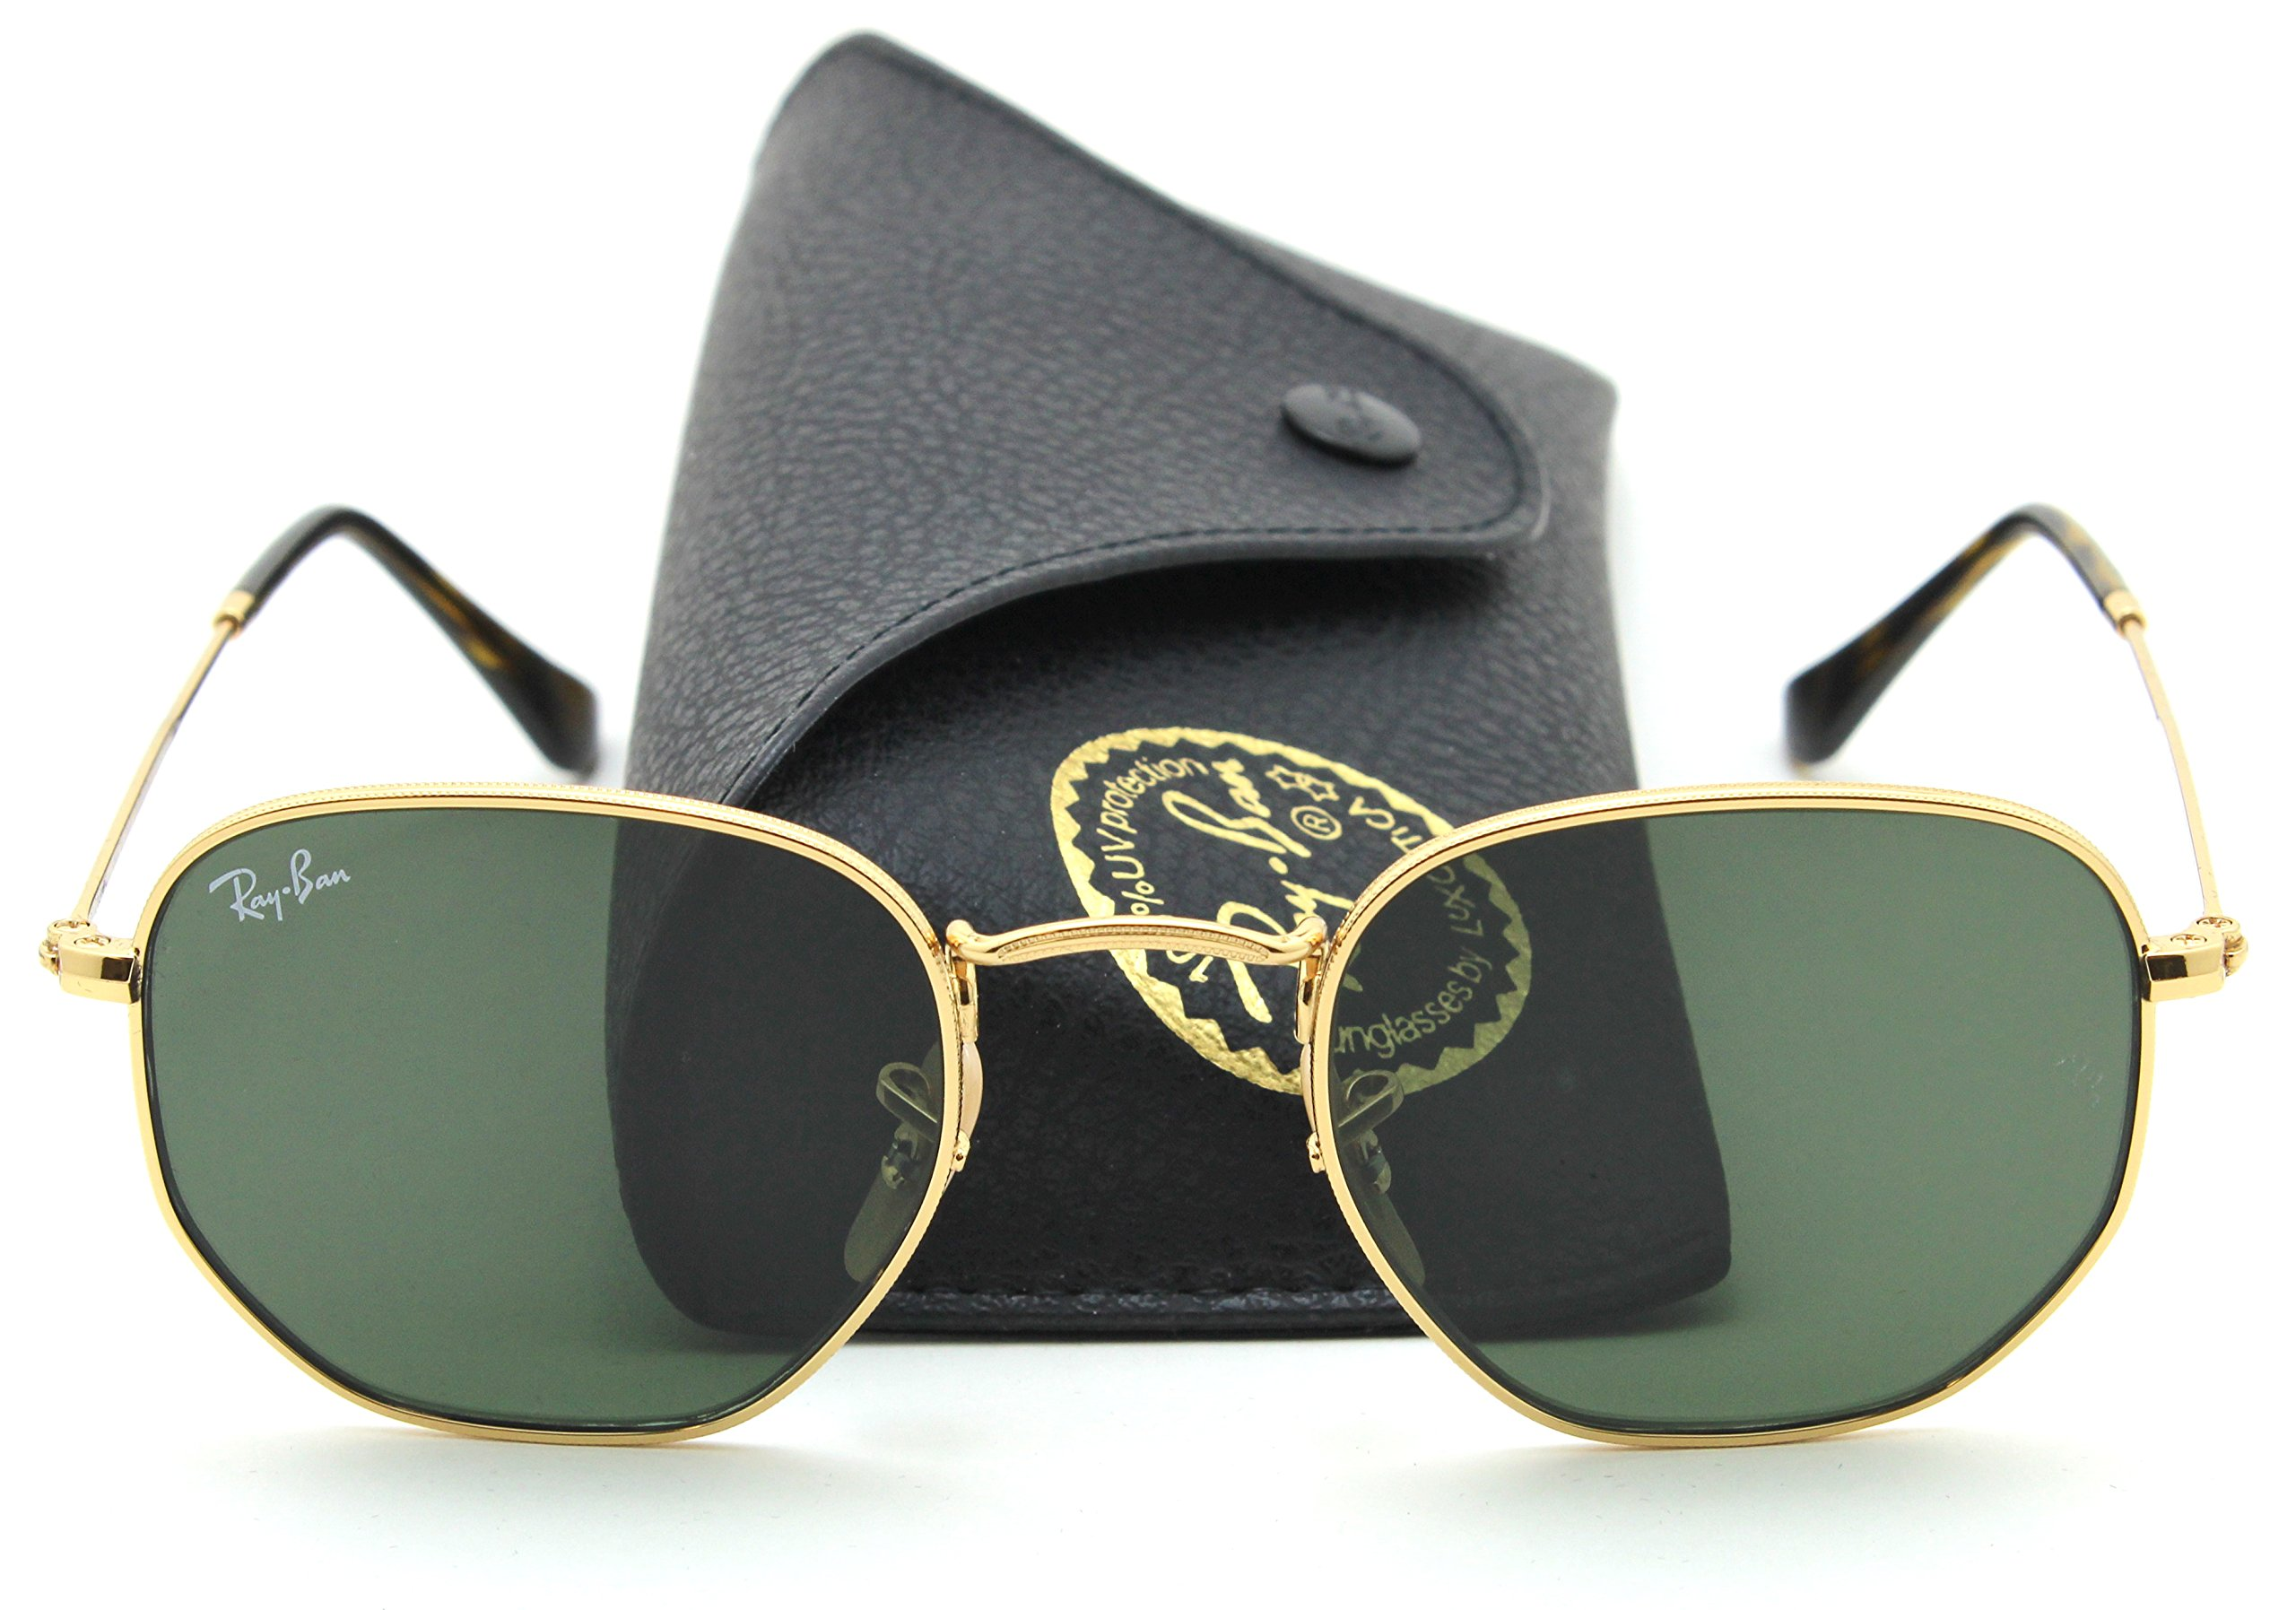 Ray-Ban RB3548N HEXAGONAL FLAT LENSES Sunglasses 001, 48mm